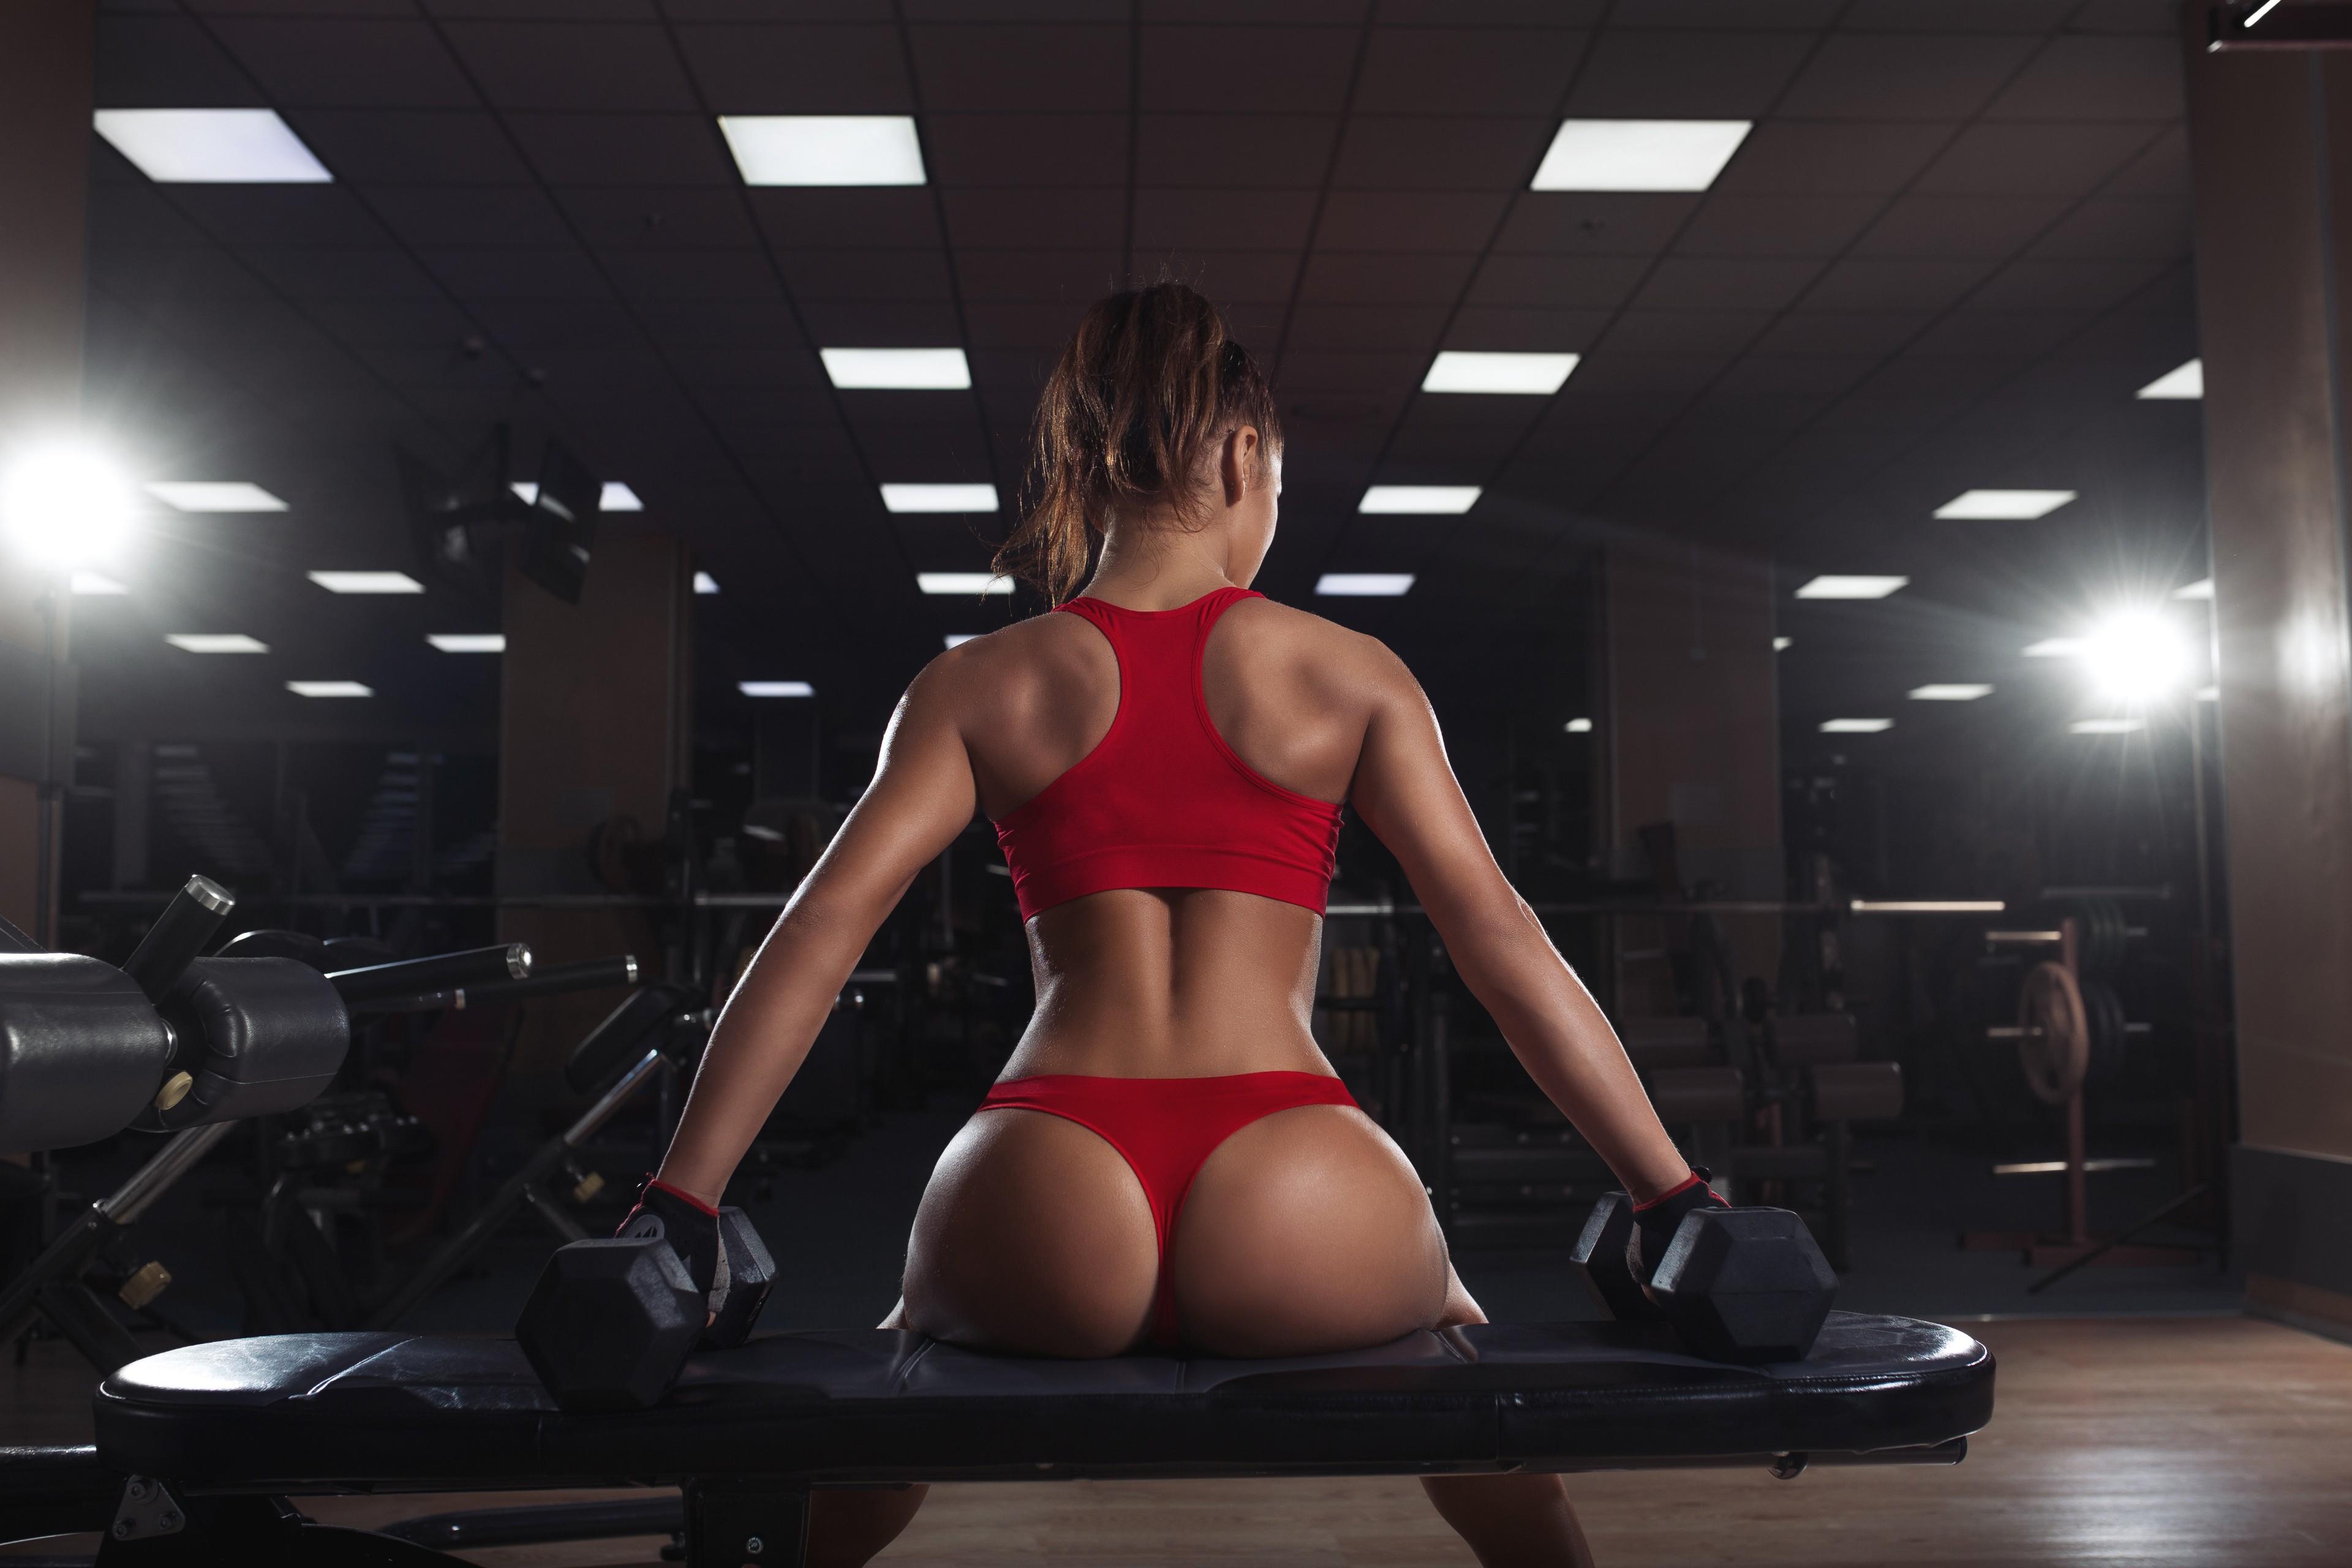 Super hot fitness girls